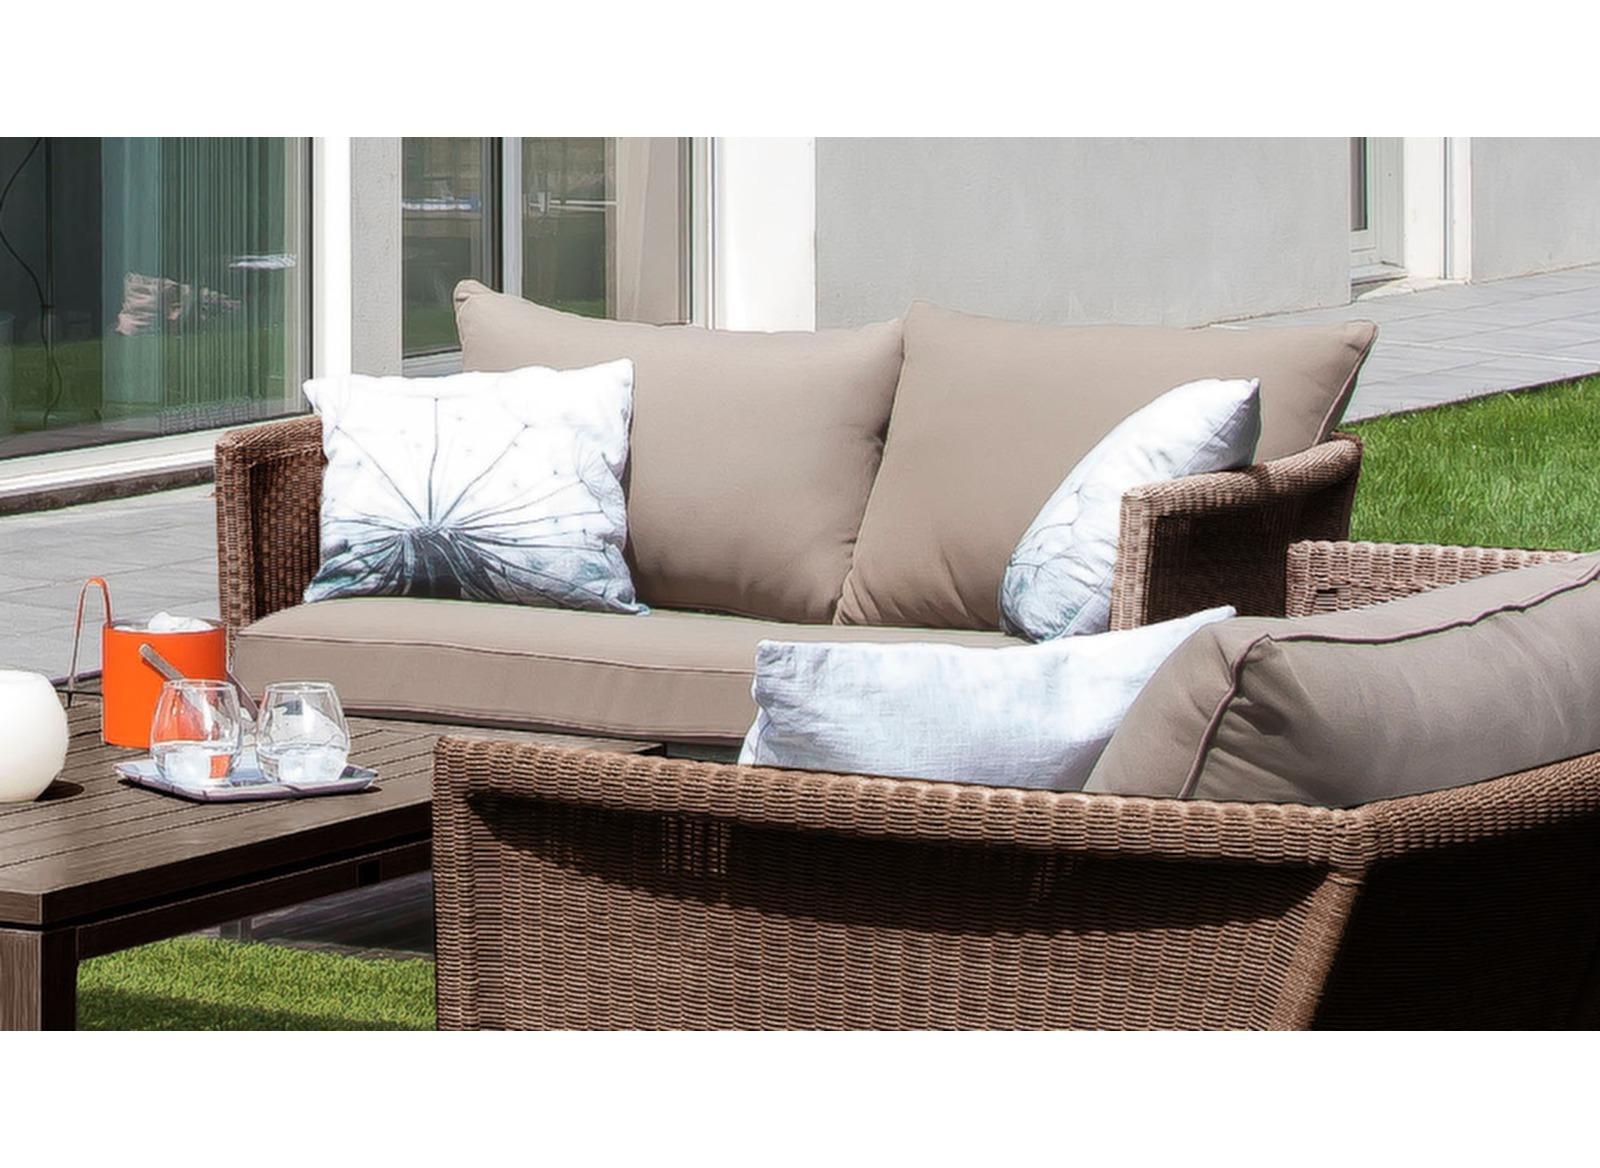 promotions canap de jardin 2 places thyme proloisirs. Black Bedroom Furniture Sets. Home Design Ideas